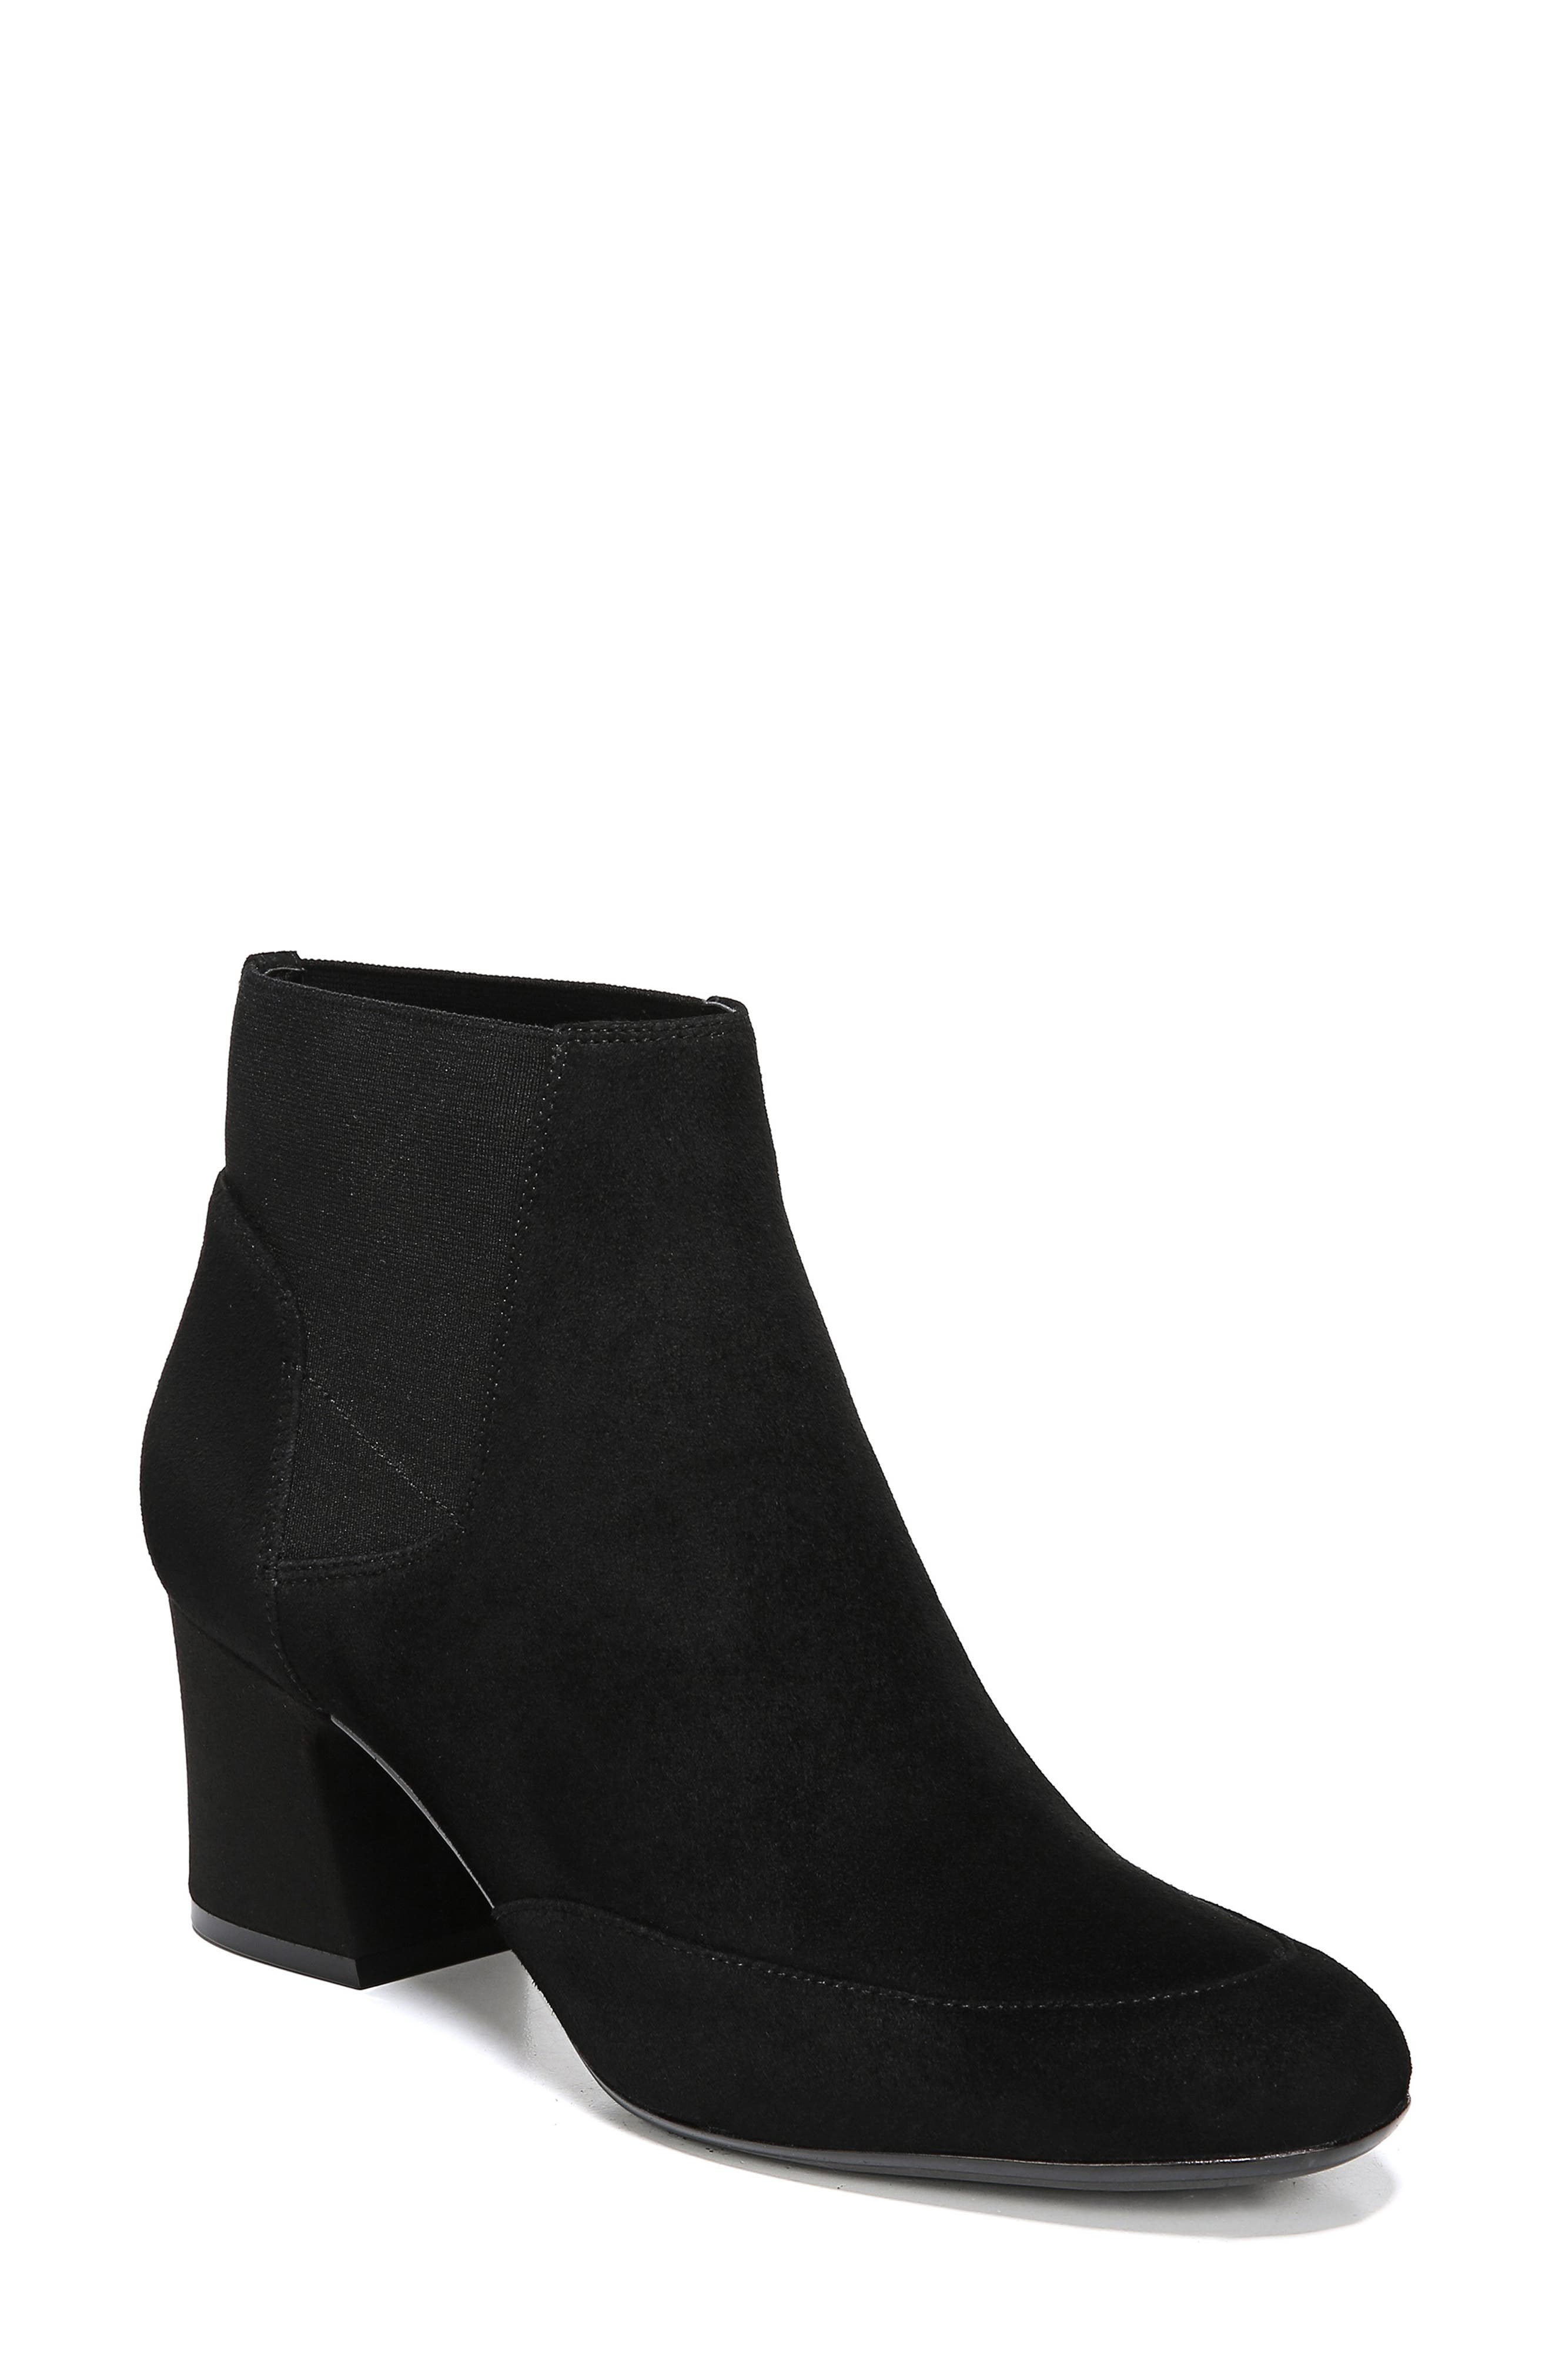 Naturalizer Danica Ankle Bootie, Black